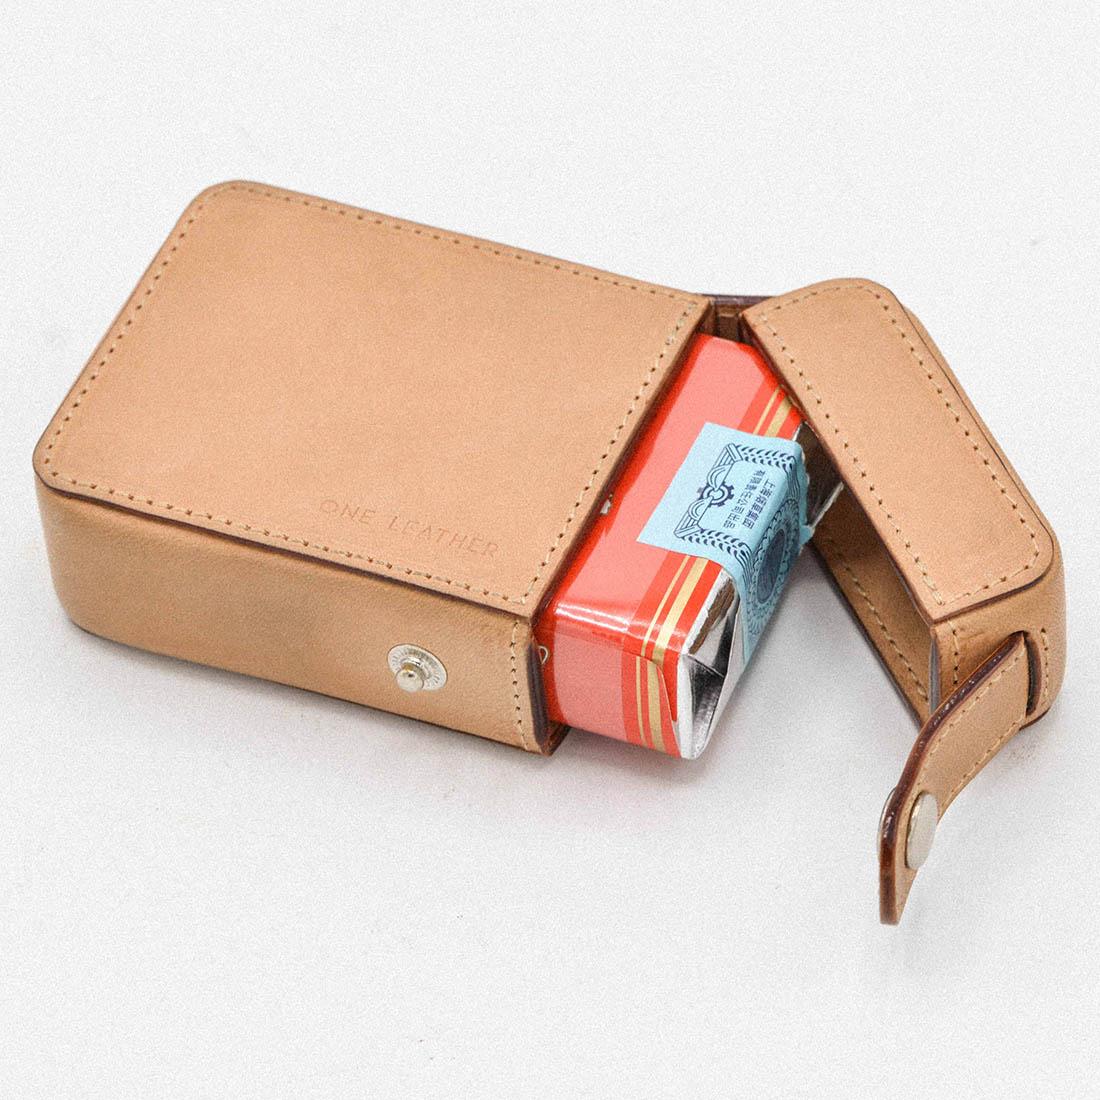 One Leather Cigarette Box Men Gift Cigarette Case Mens Gifts Cigarette Cover Smoke Tobacco Pouch Vegetable Tanned Leather|Cigarette Accessories| |  - title=